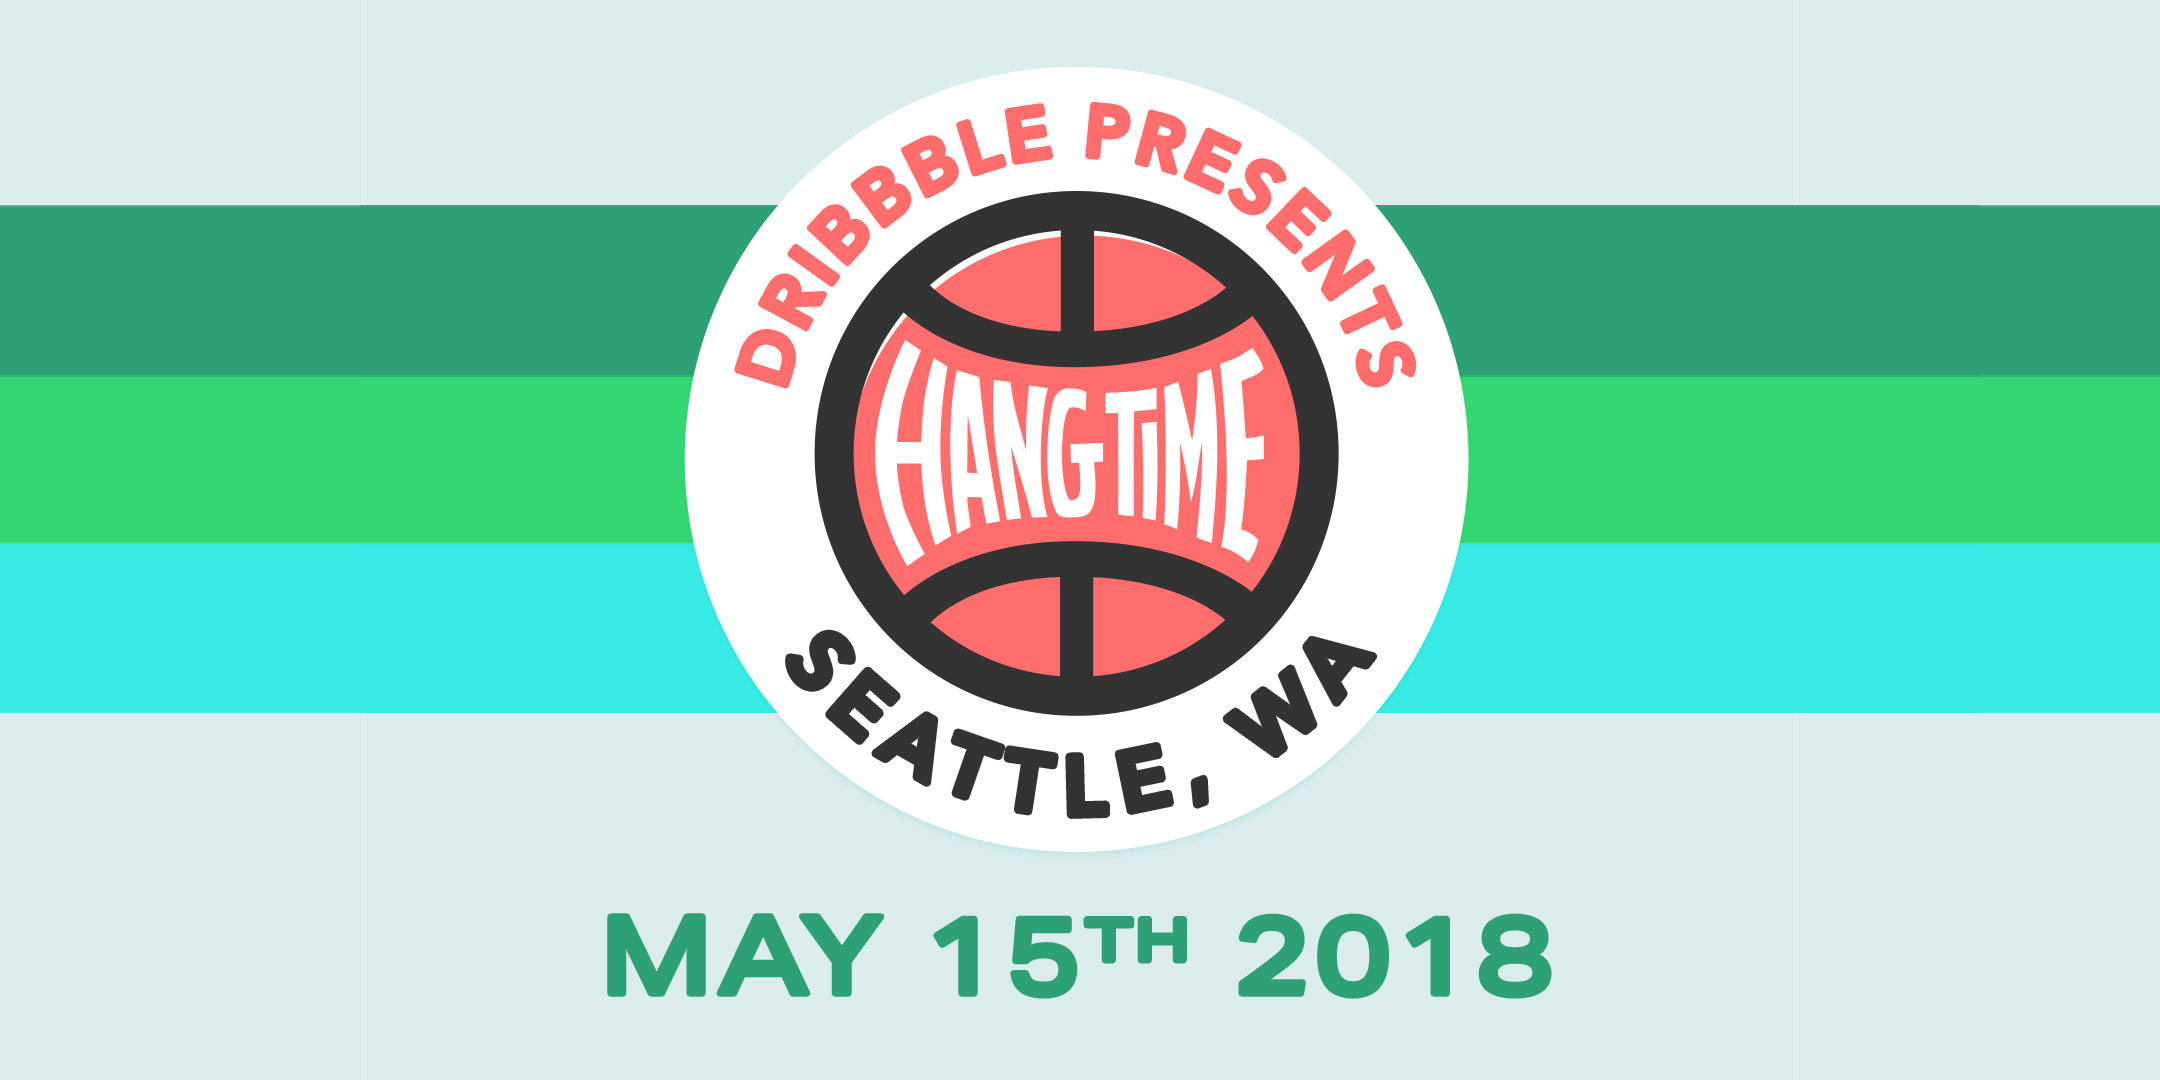 Hangtime seattle eb banner